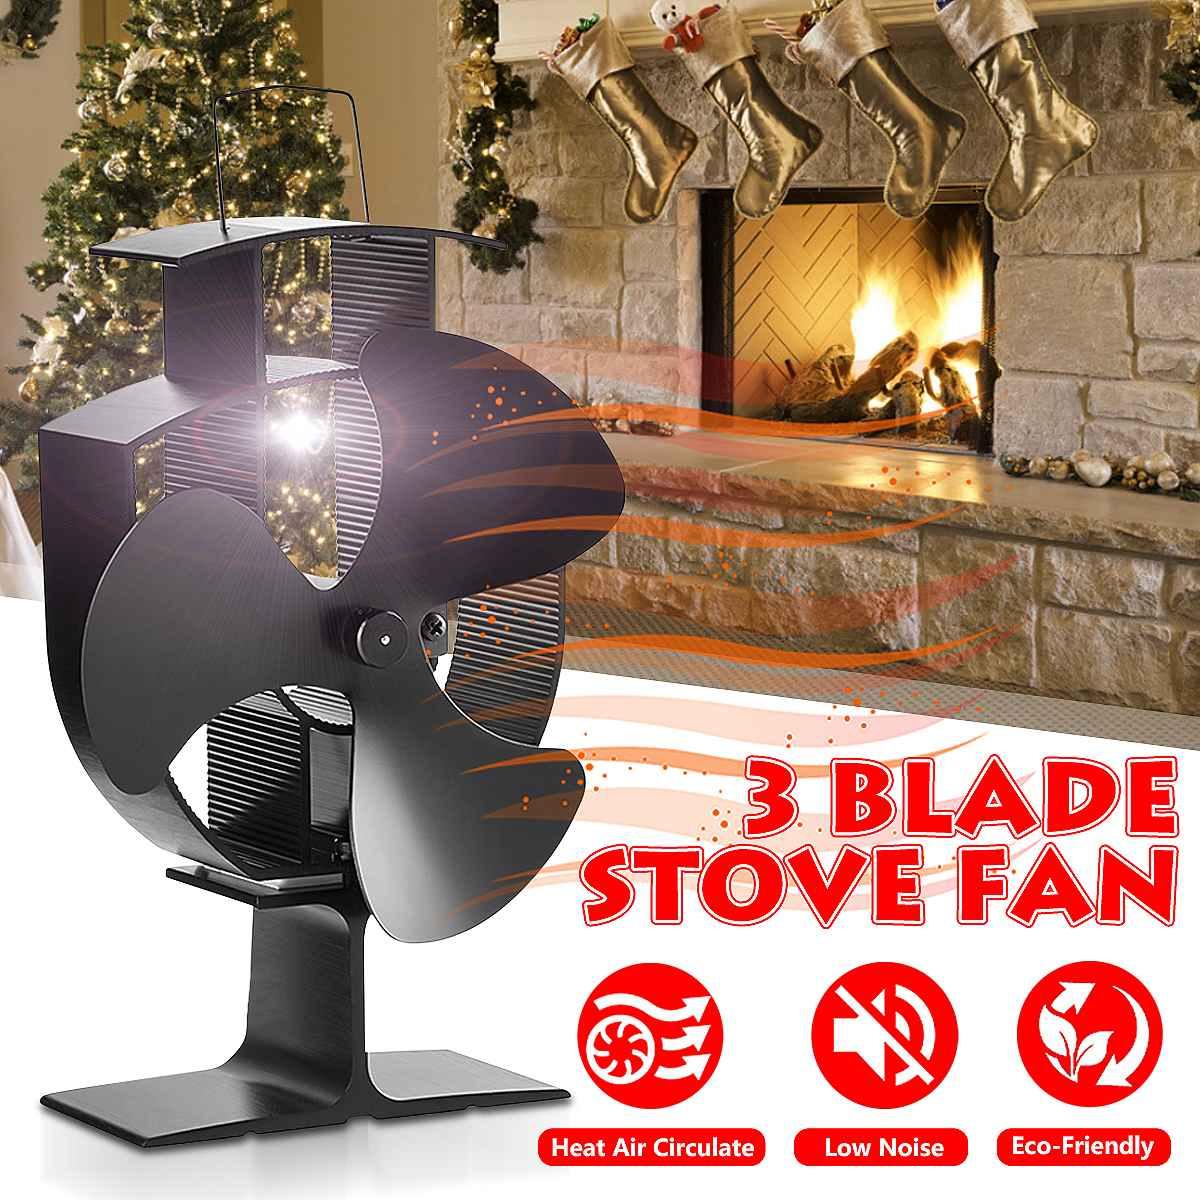 Black Fireplace 3 Blade Heat Powered Stove Fan Komin Log Wood Burner Eco Friendly Quiet Fan Home Efficient Heat Distribution